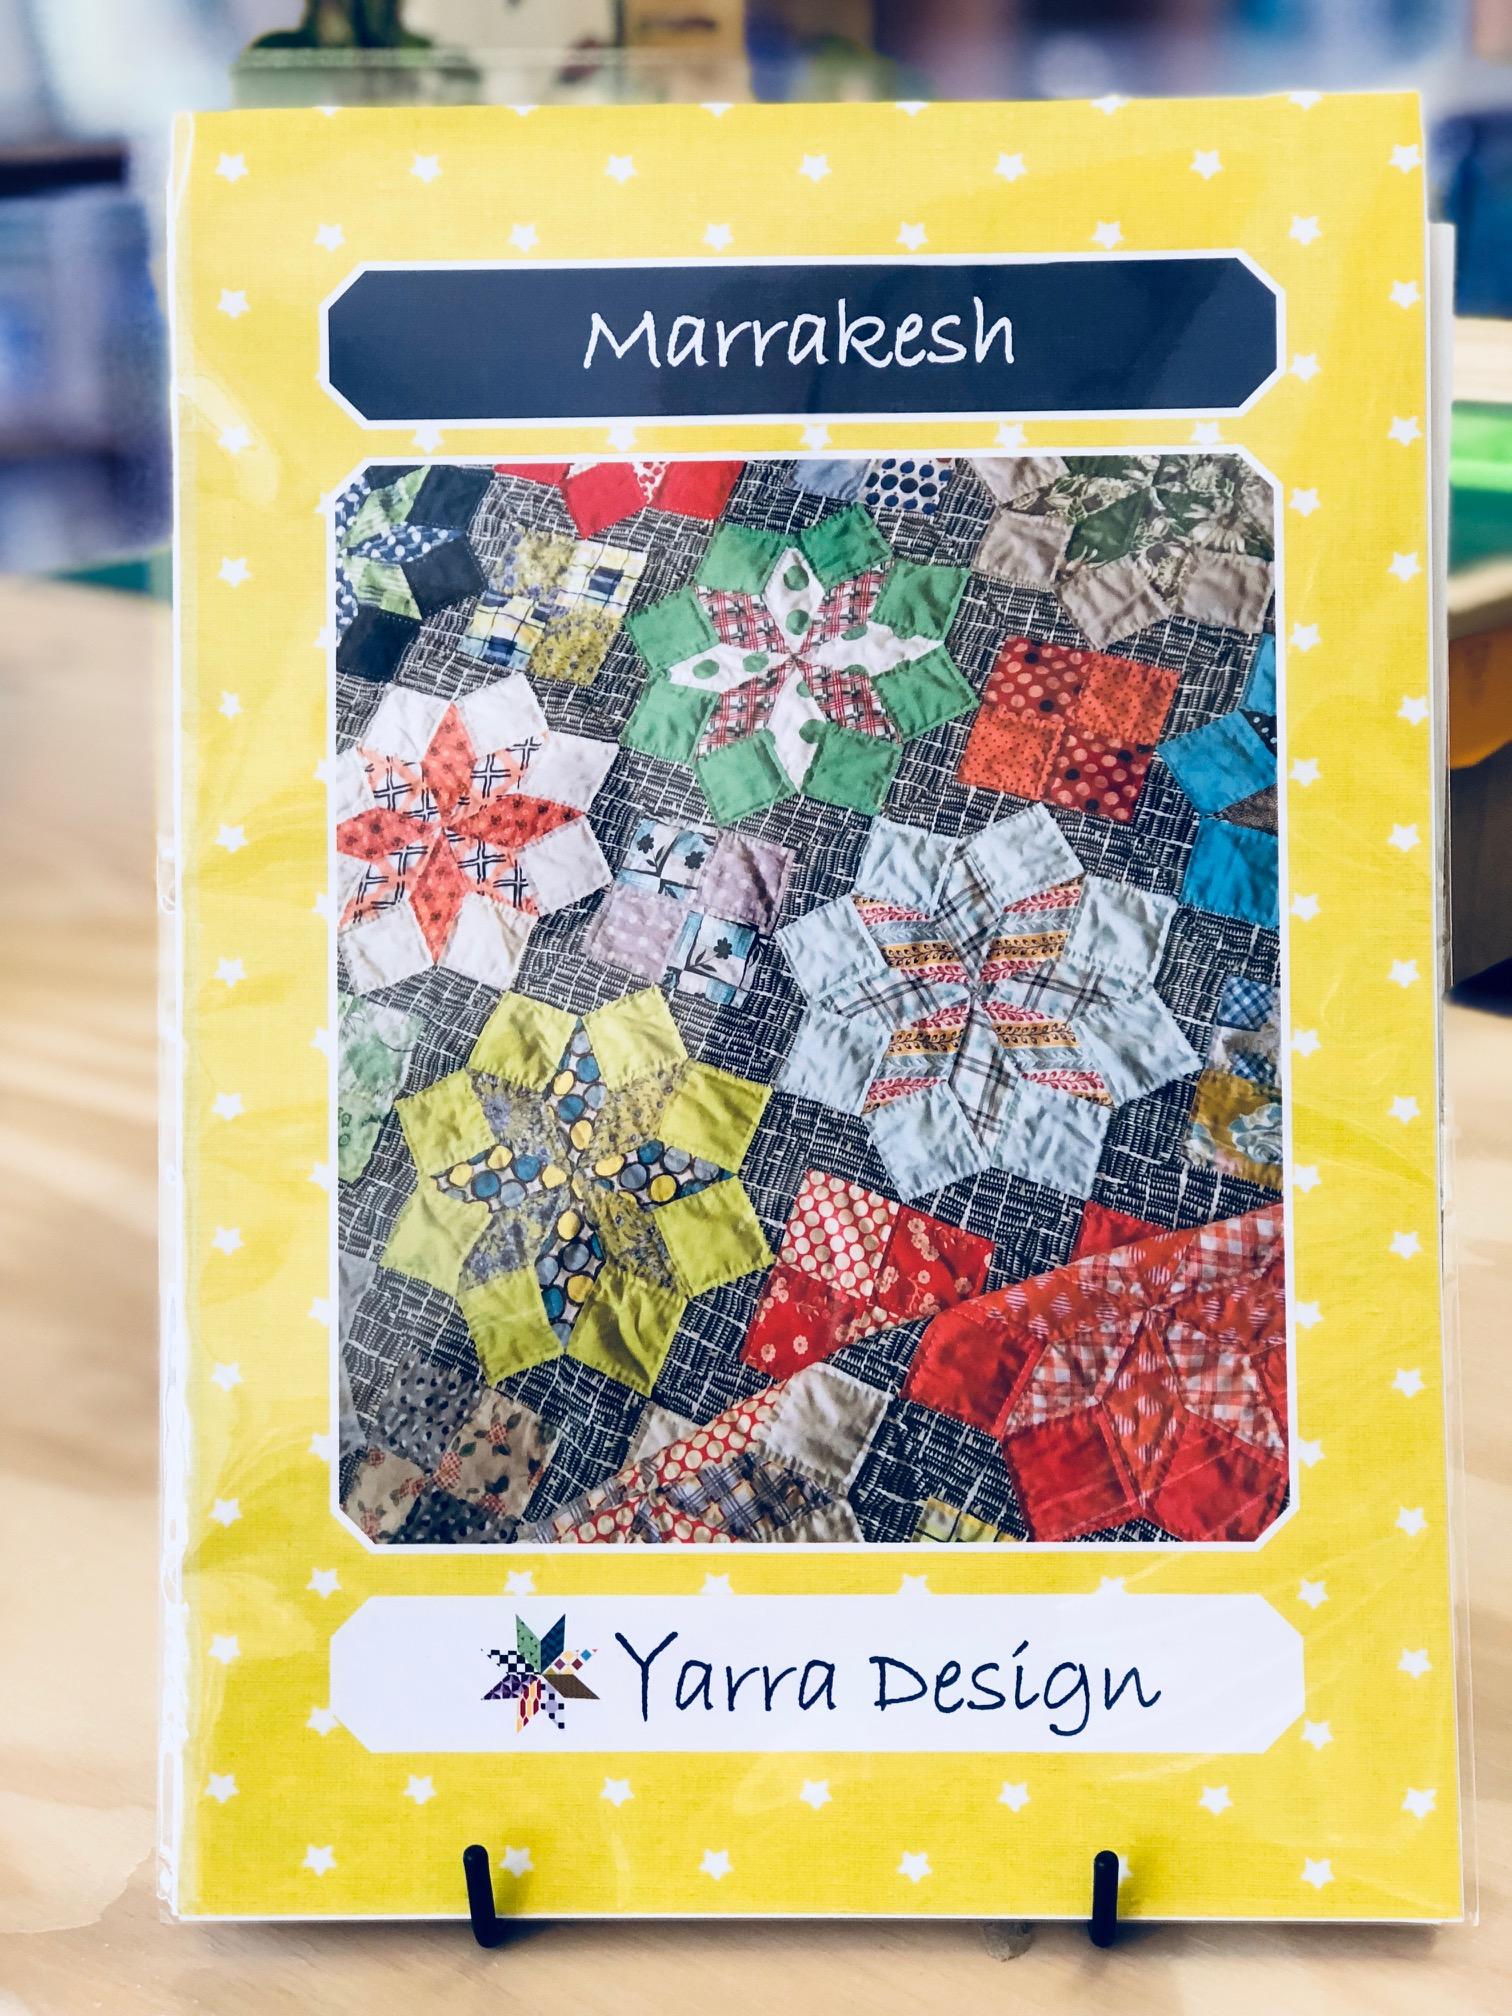 Yarra Design - Marrakesh